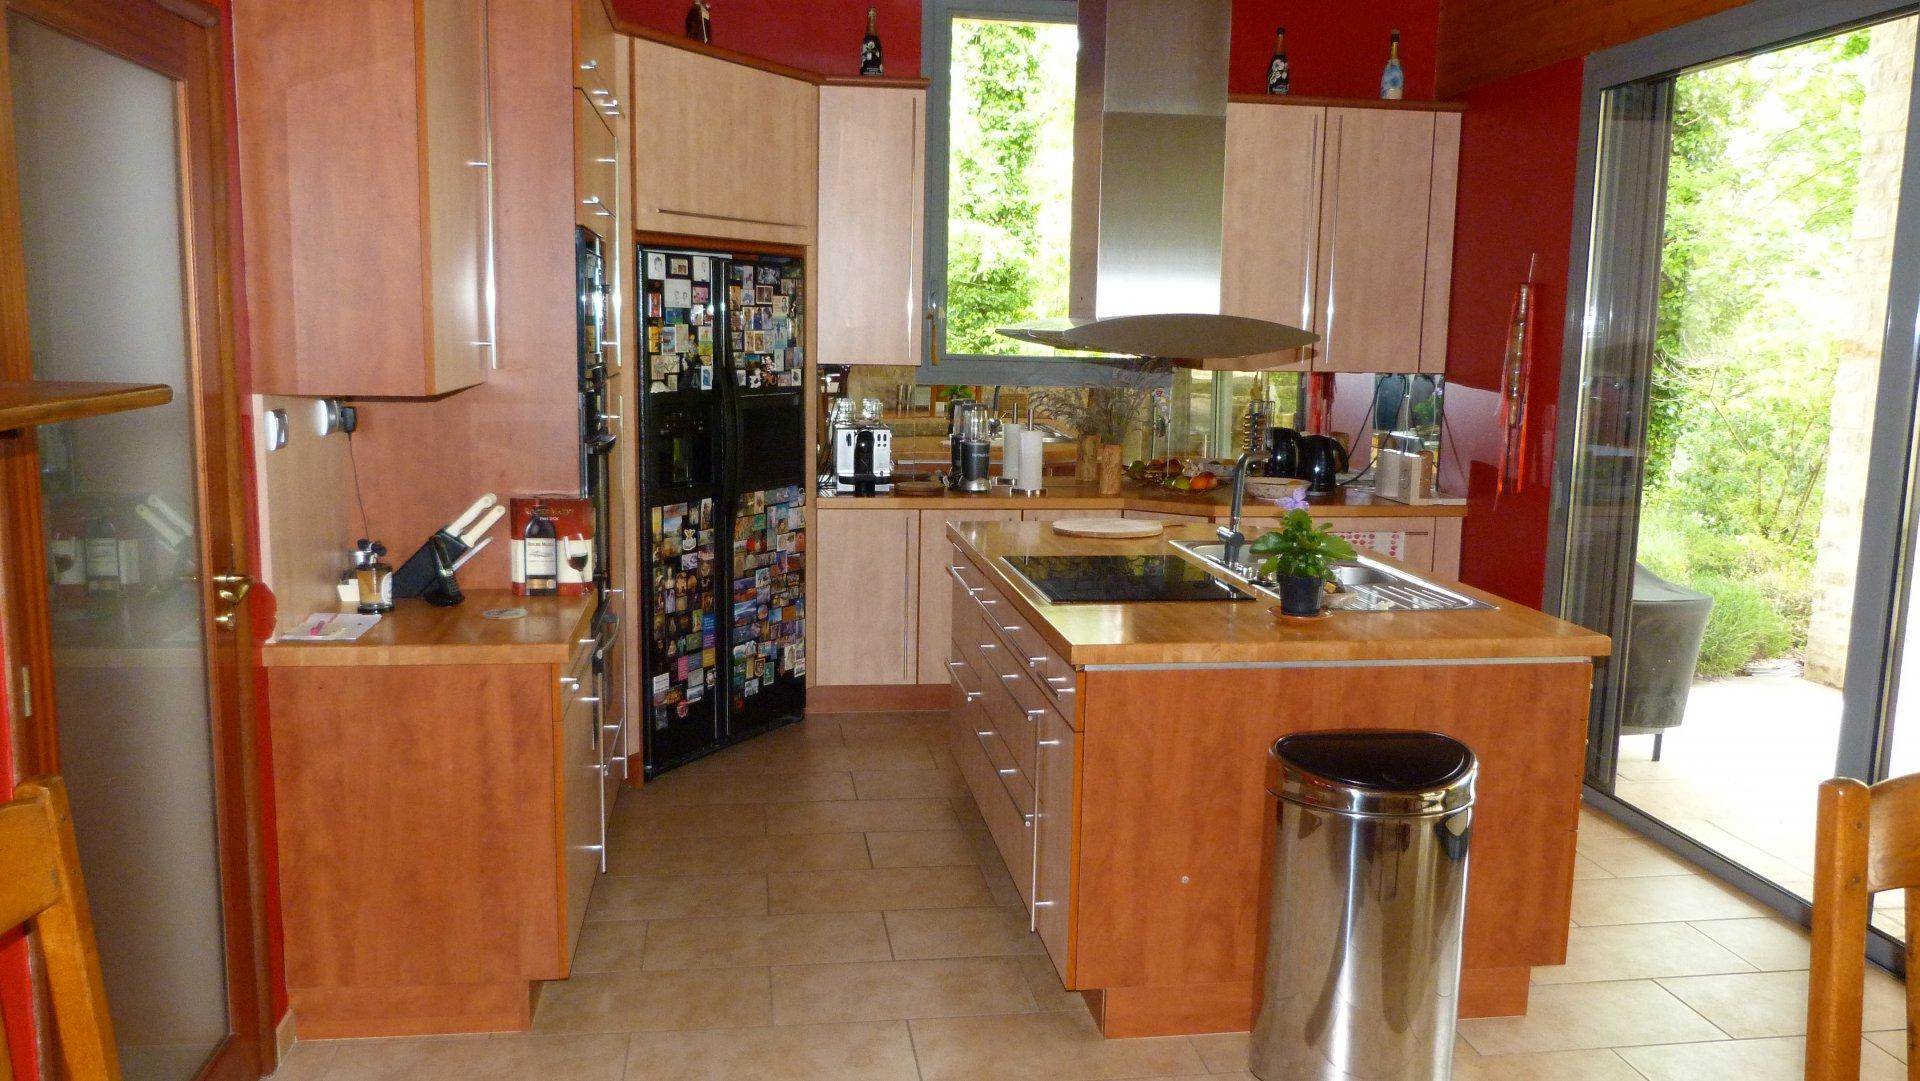 Stainless steel, kitchen island